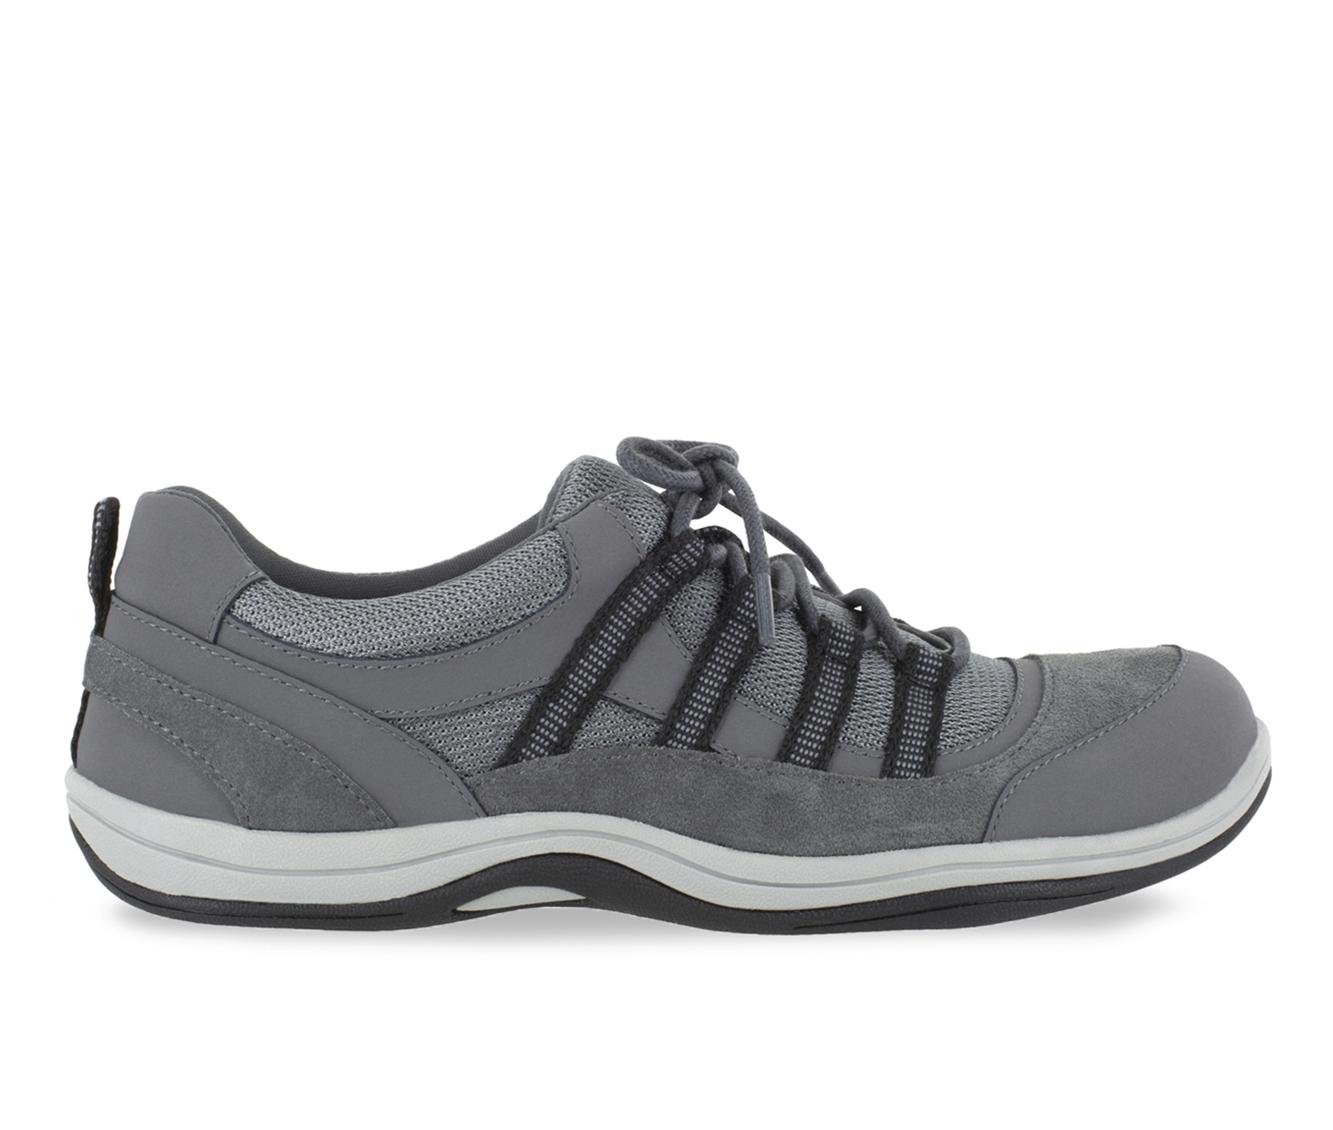 Easy Street Merrimack Women's Shoe (Gray Leather)